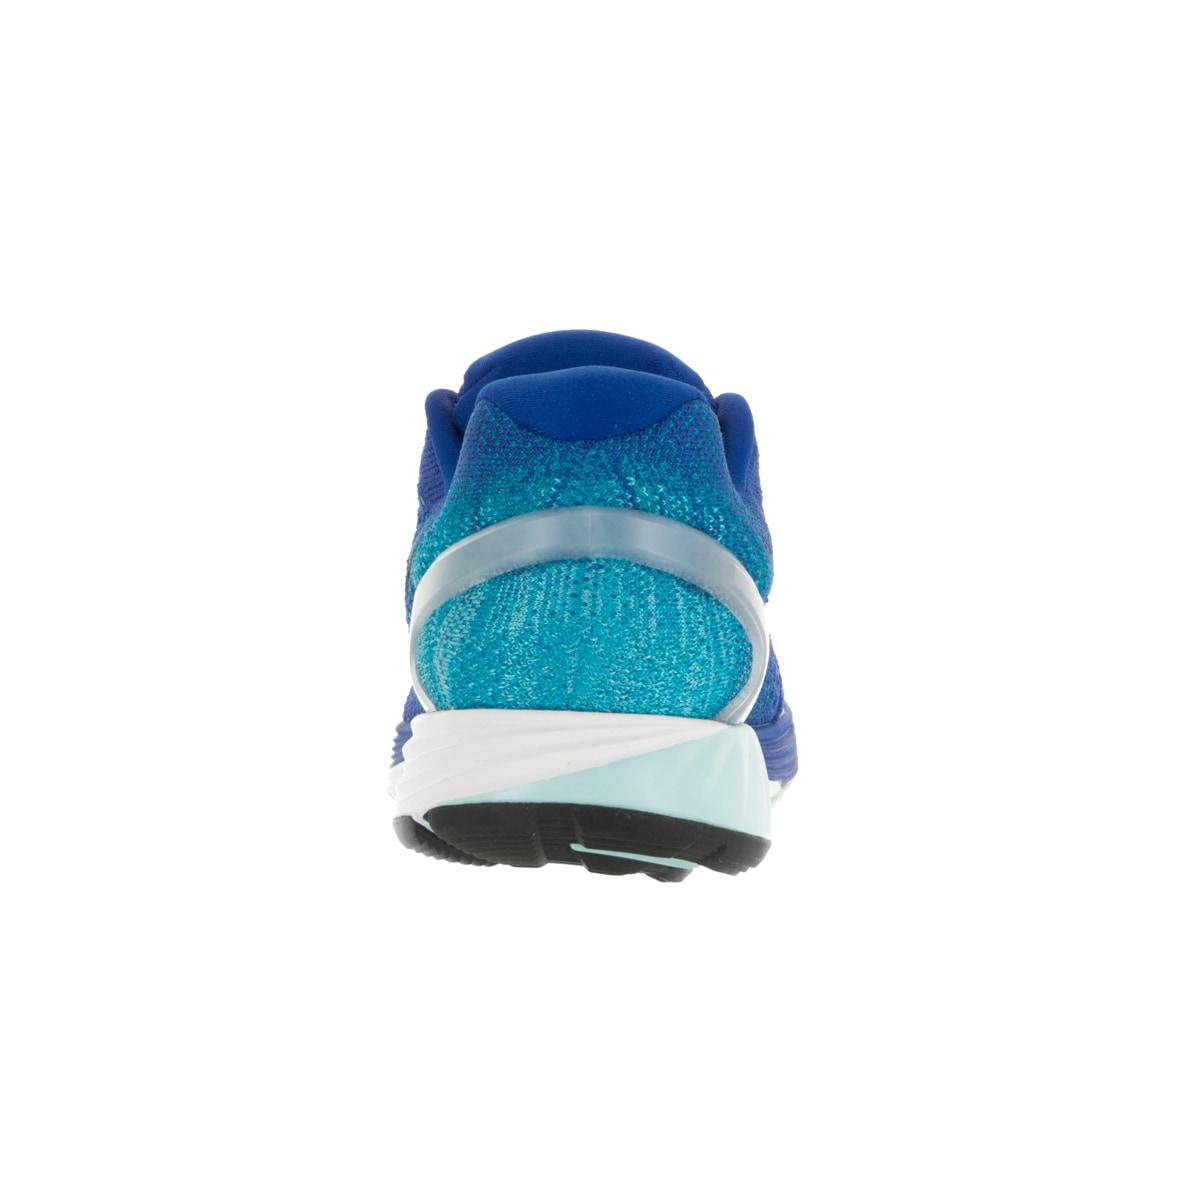 89eee255c09b Shop Nike Men s Lunarglide 7 Game Royal Black Blue Lagoon Running Shoe -  Free Shipping Today - Overstock - 13394952